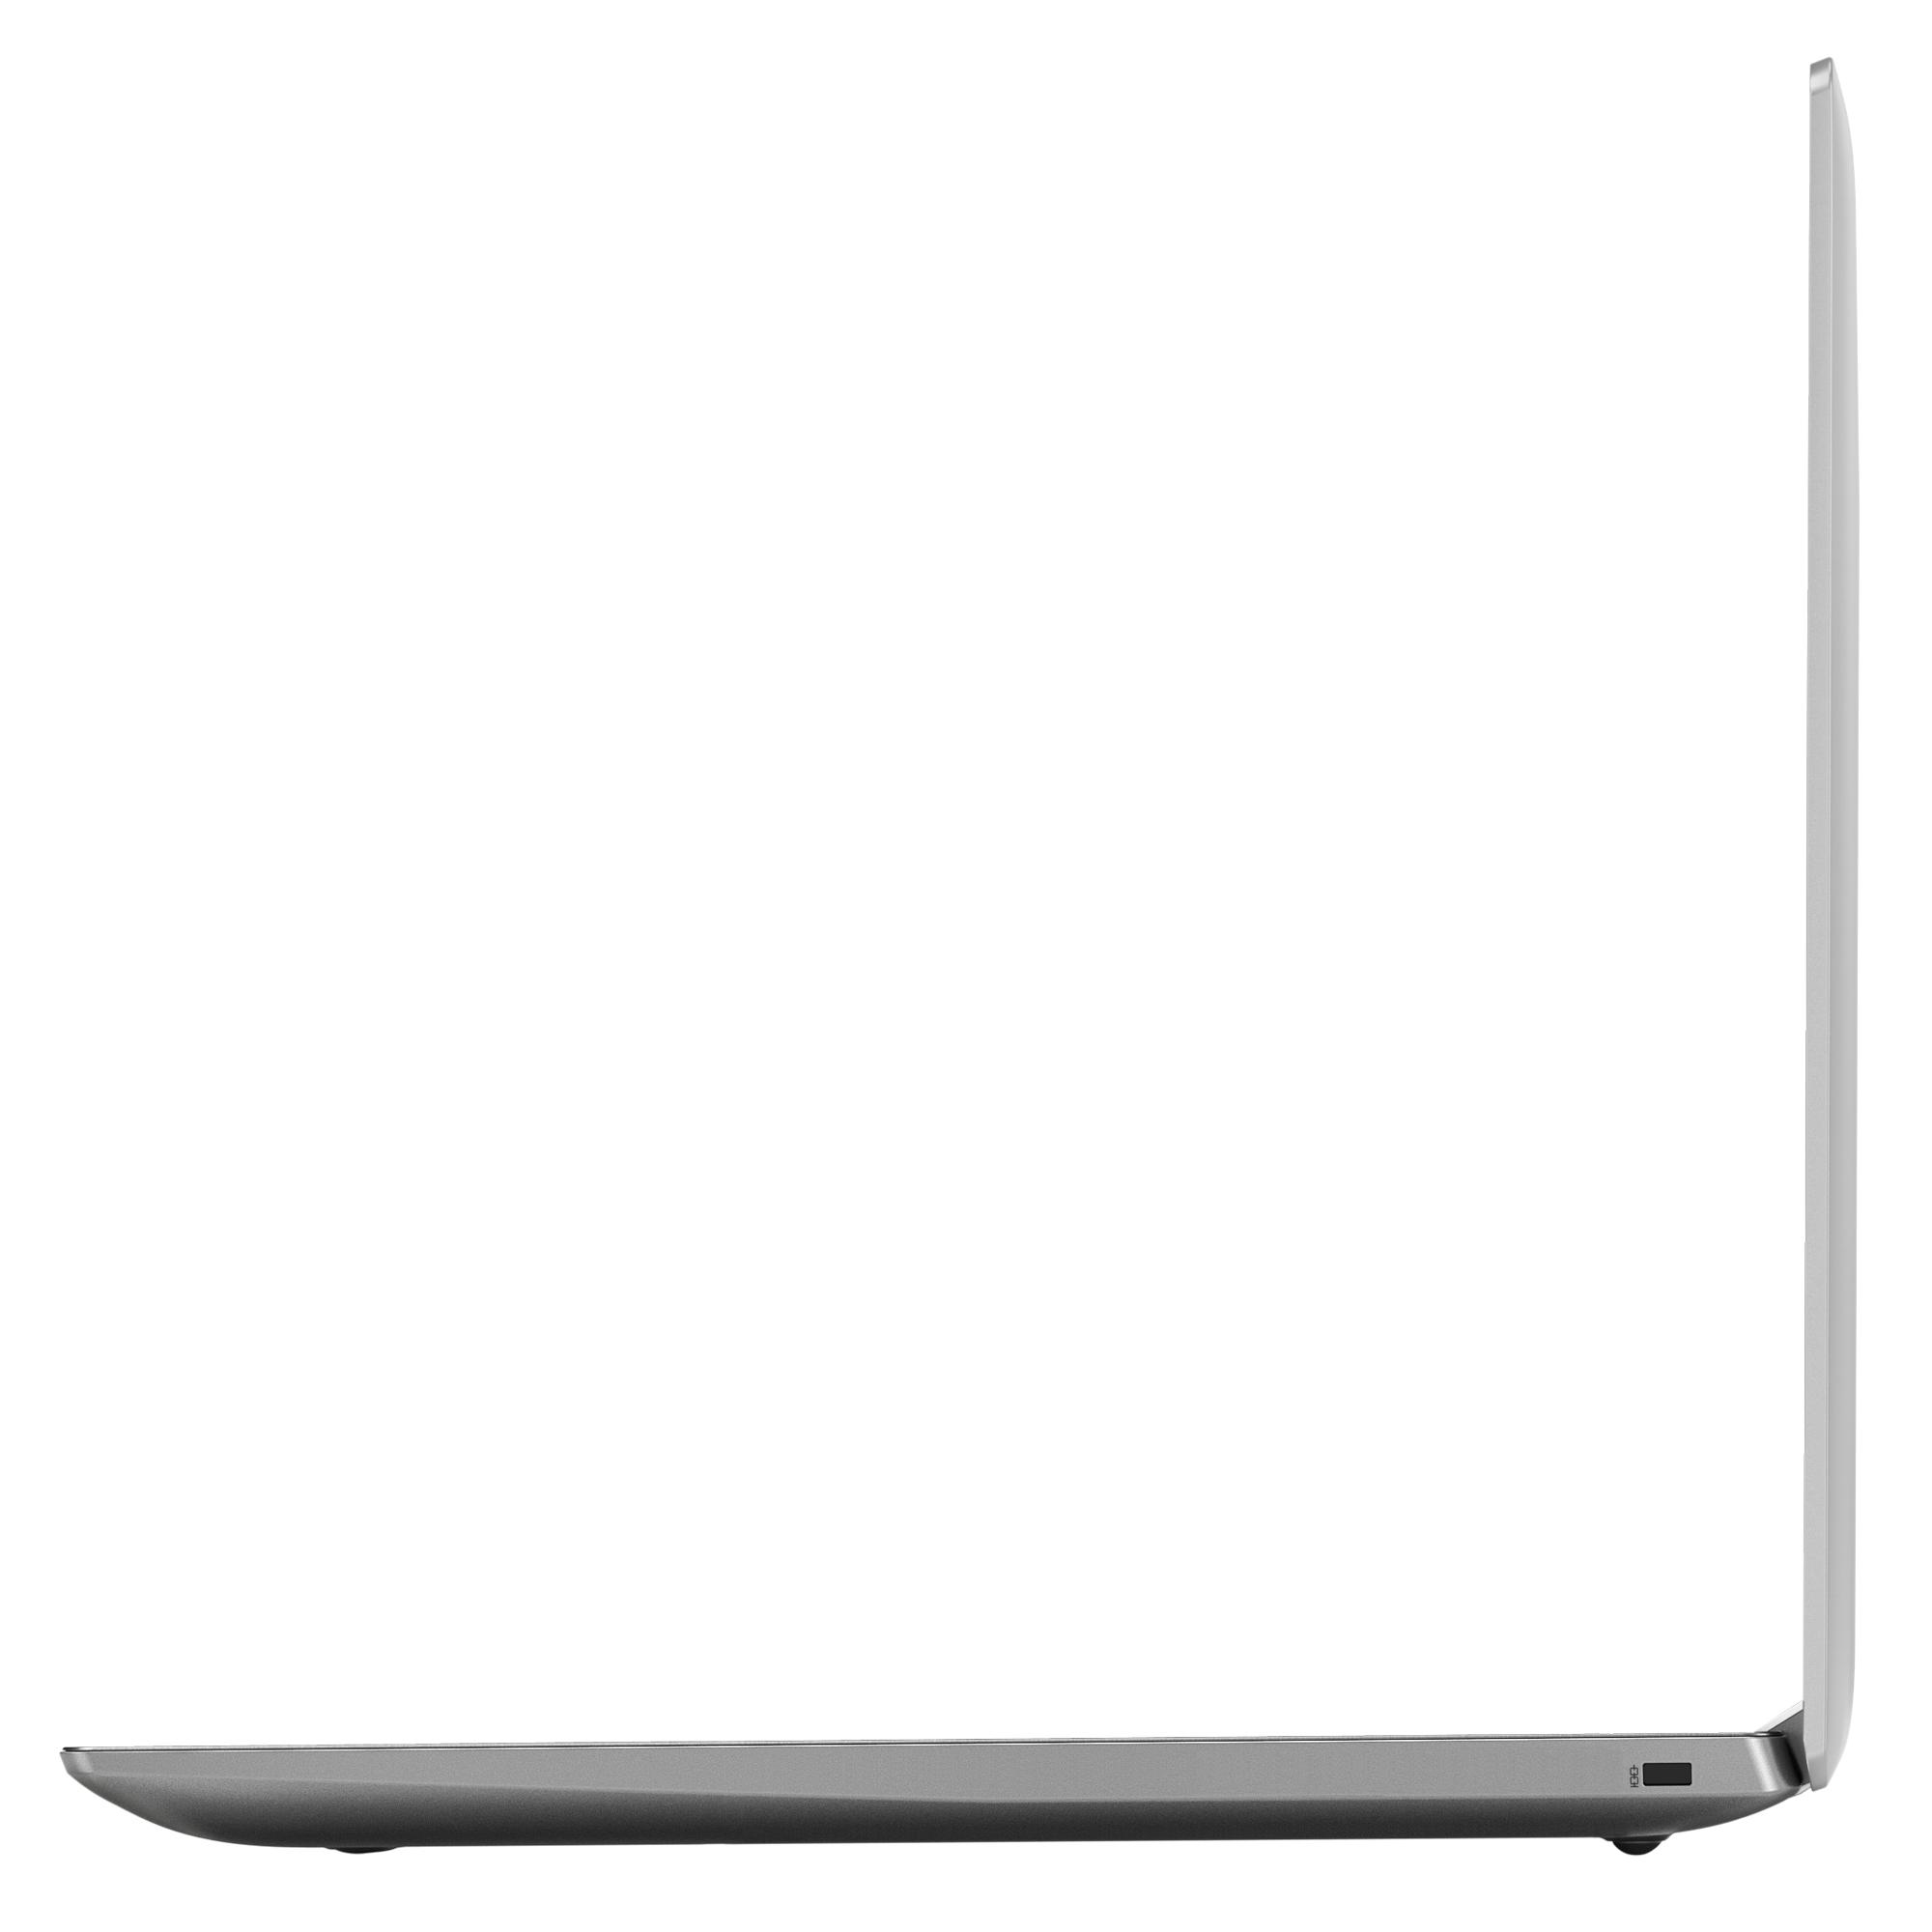 Фото  Ноутбук Lenovo ideapad 330-15IKB Platinum Grey (81DC00YCRU)